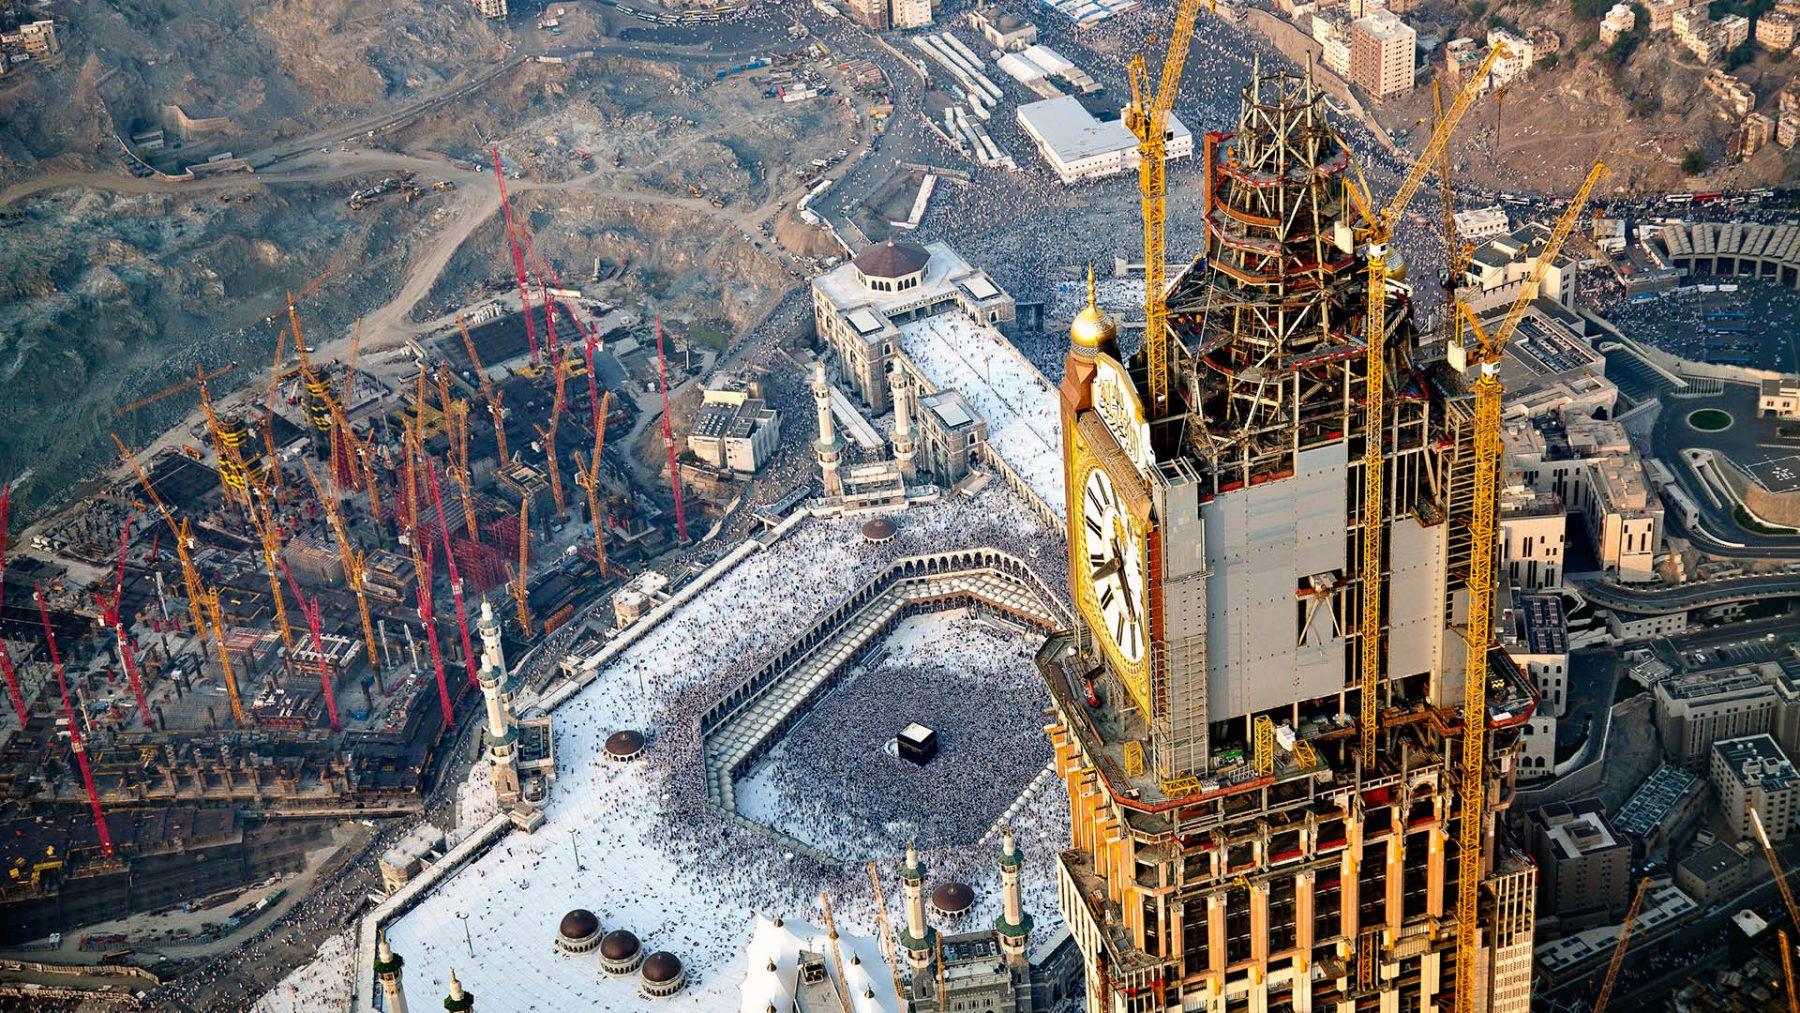 The Makkah Royal Clock Tower Sl Rasch